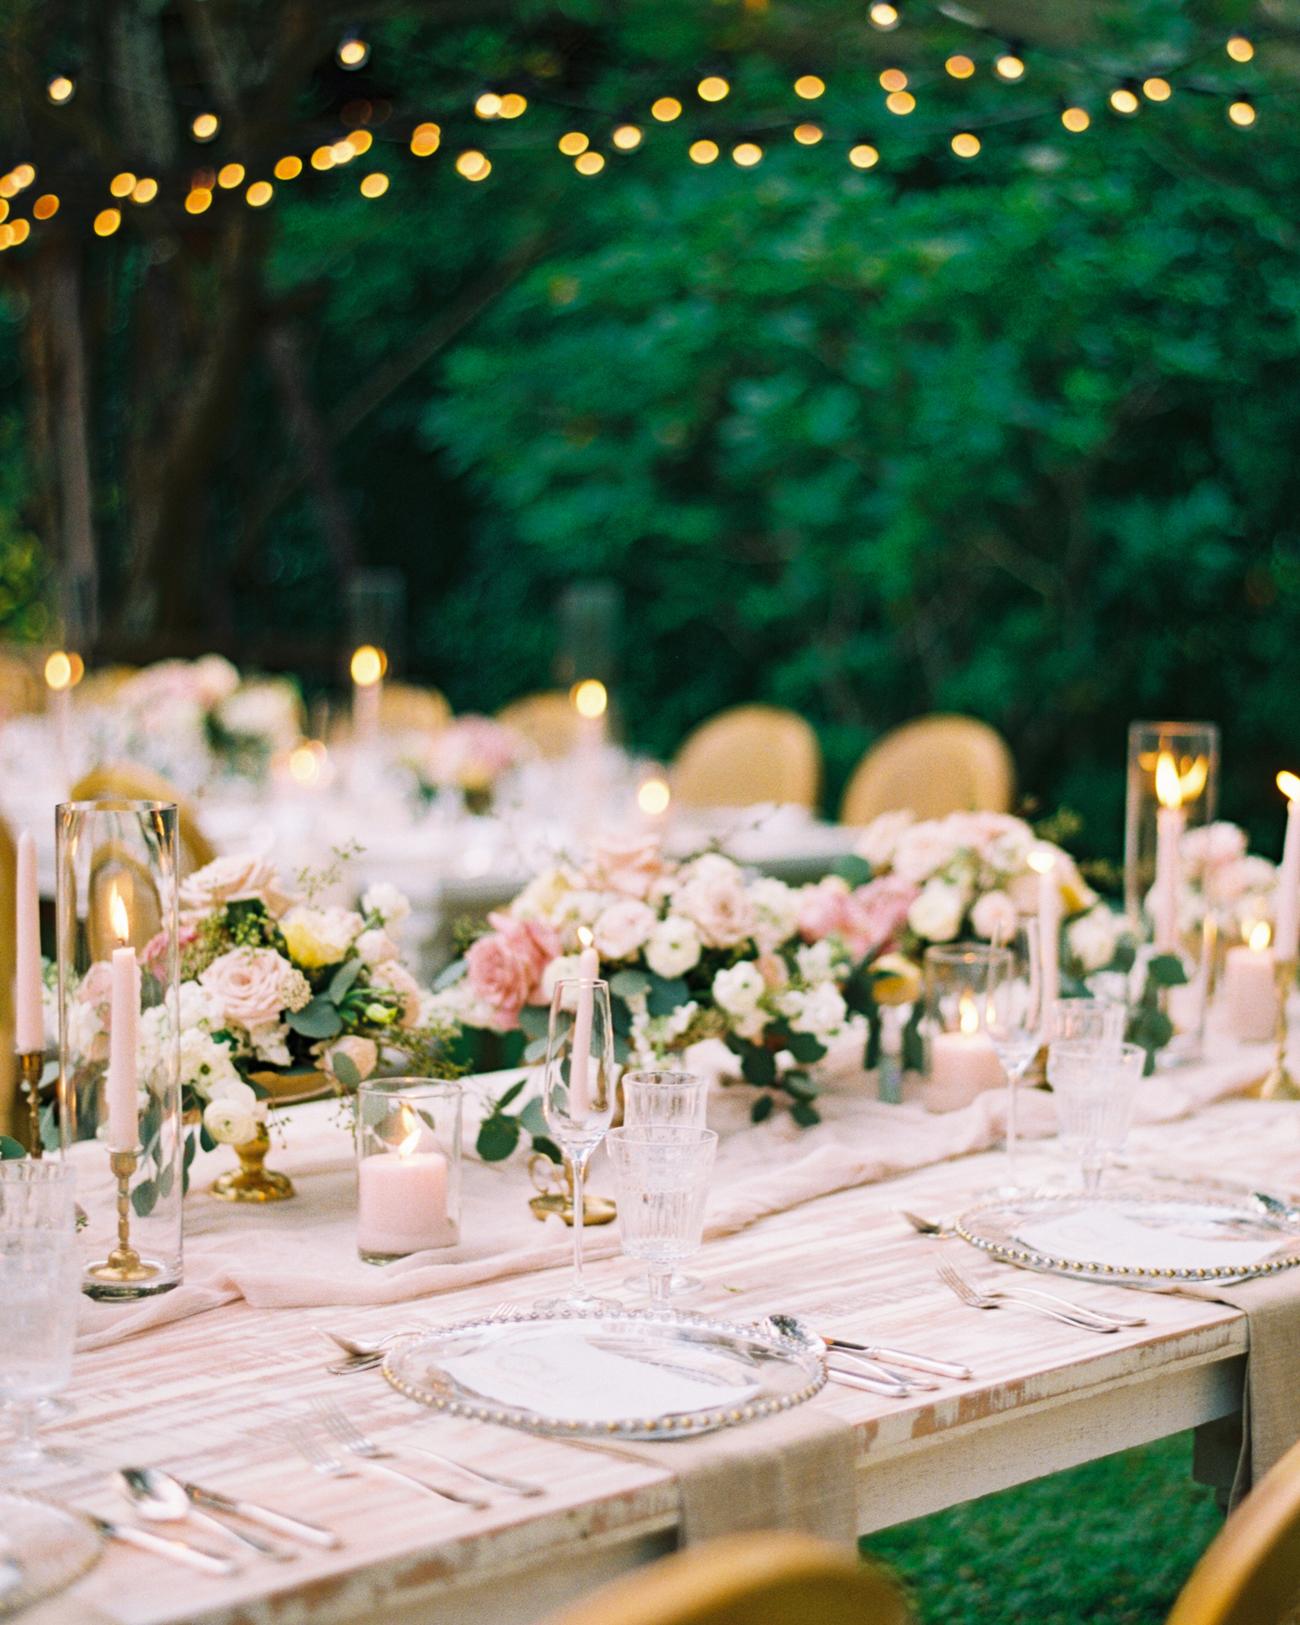 jada-jeffrey-wedding-place-setting-0619.jpg